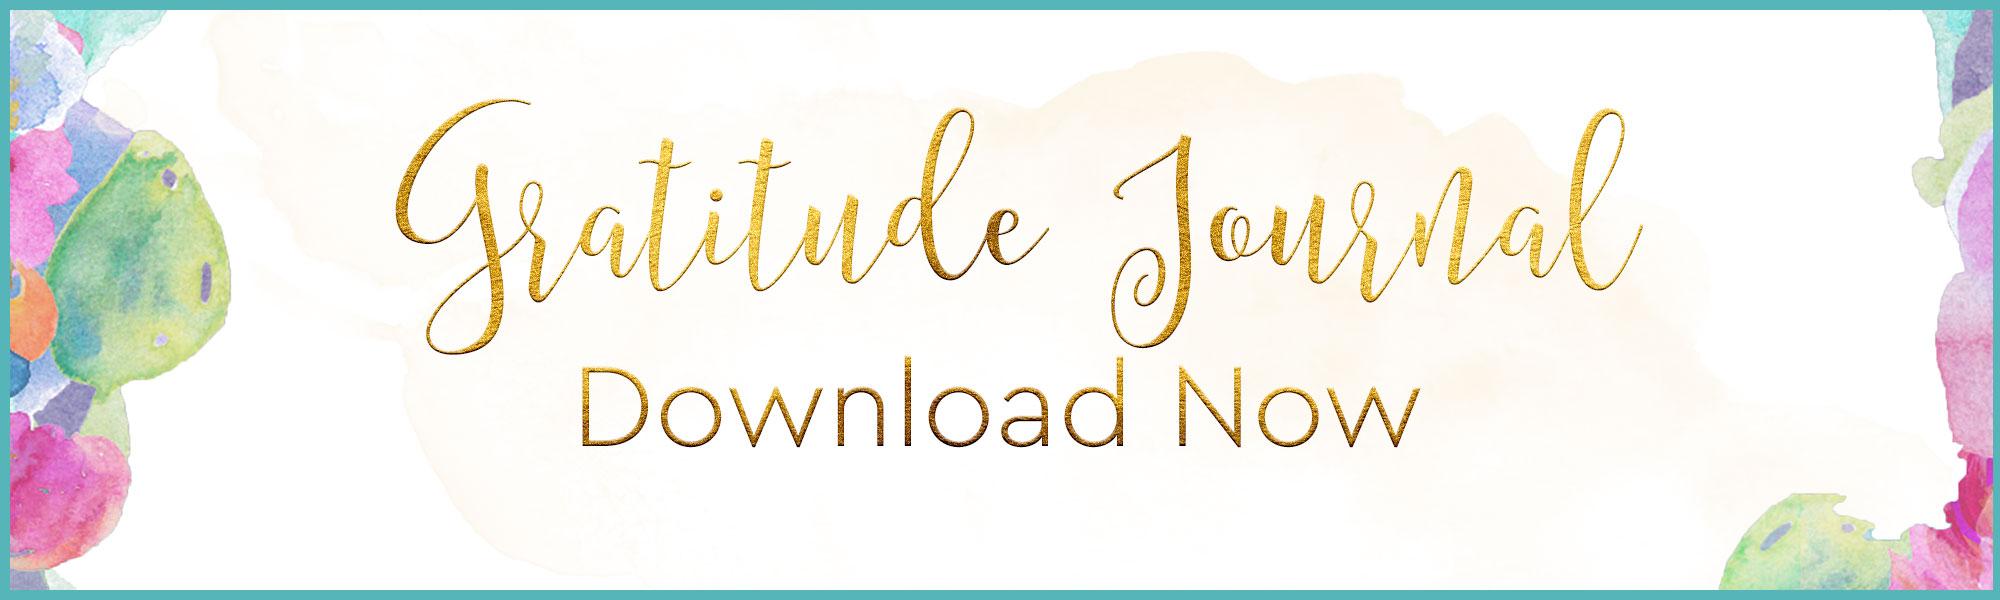 gratitude-journal-free-download.jpg